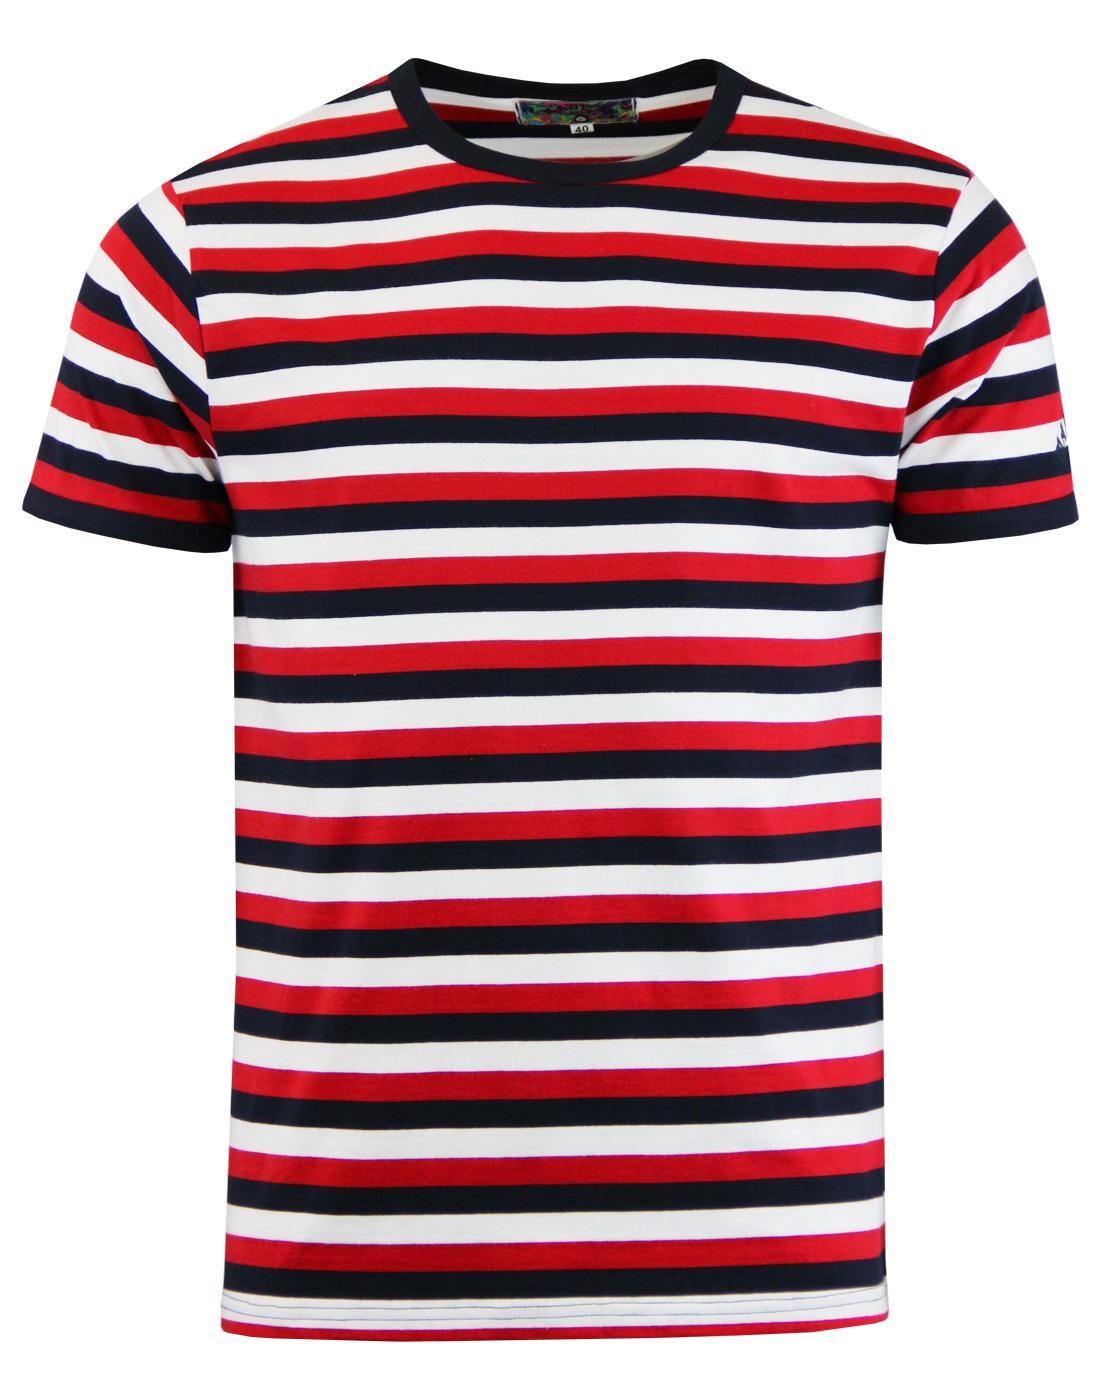 58176f97c07ab Bande - Mens Retro Mod Tri-Stripe Short Sleeve T-Shirt